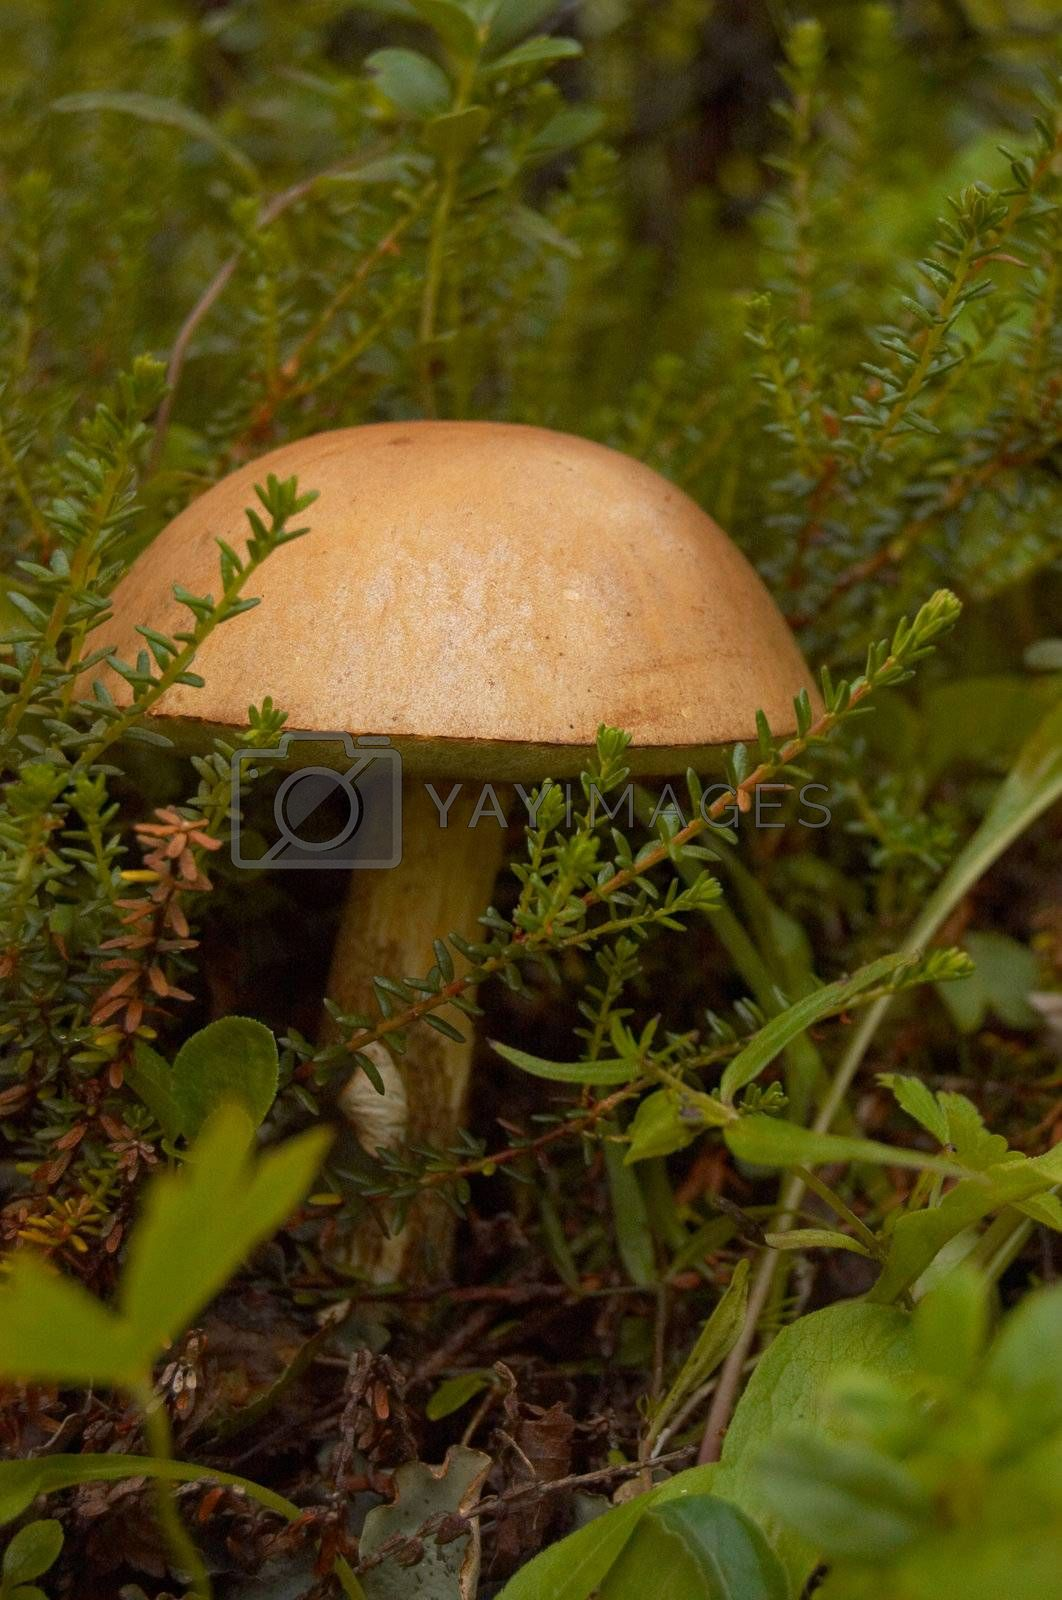 The mushroom a rough boletus grows among a moss